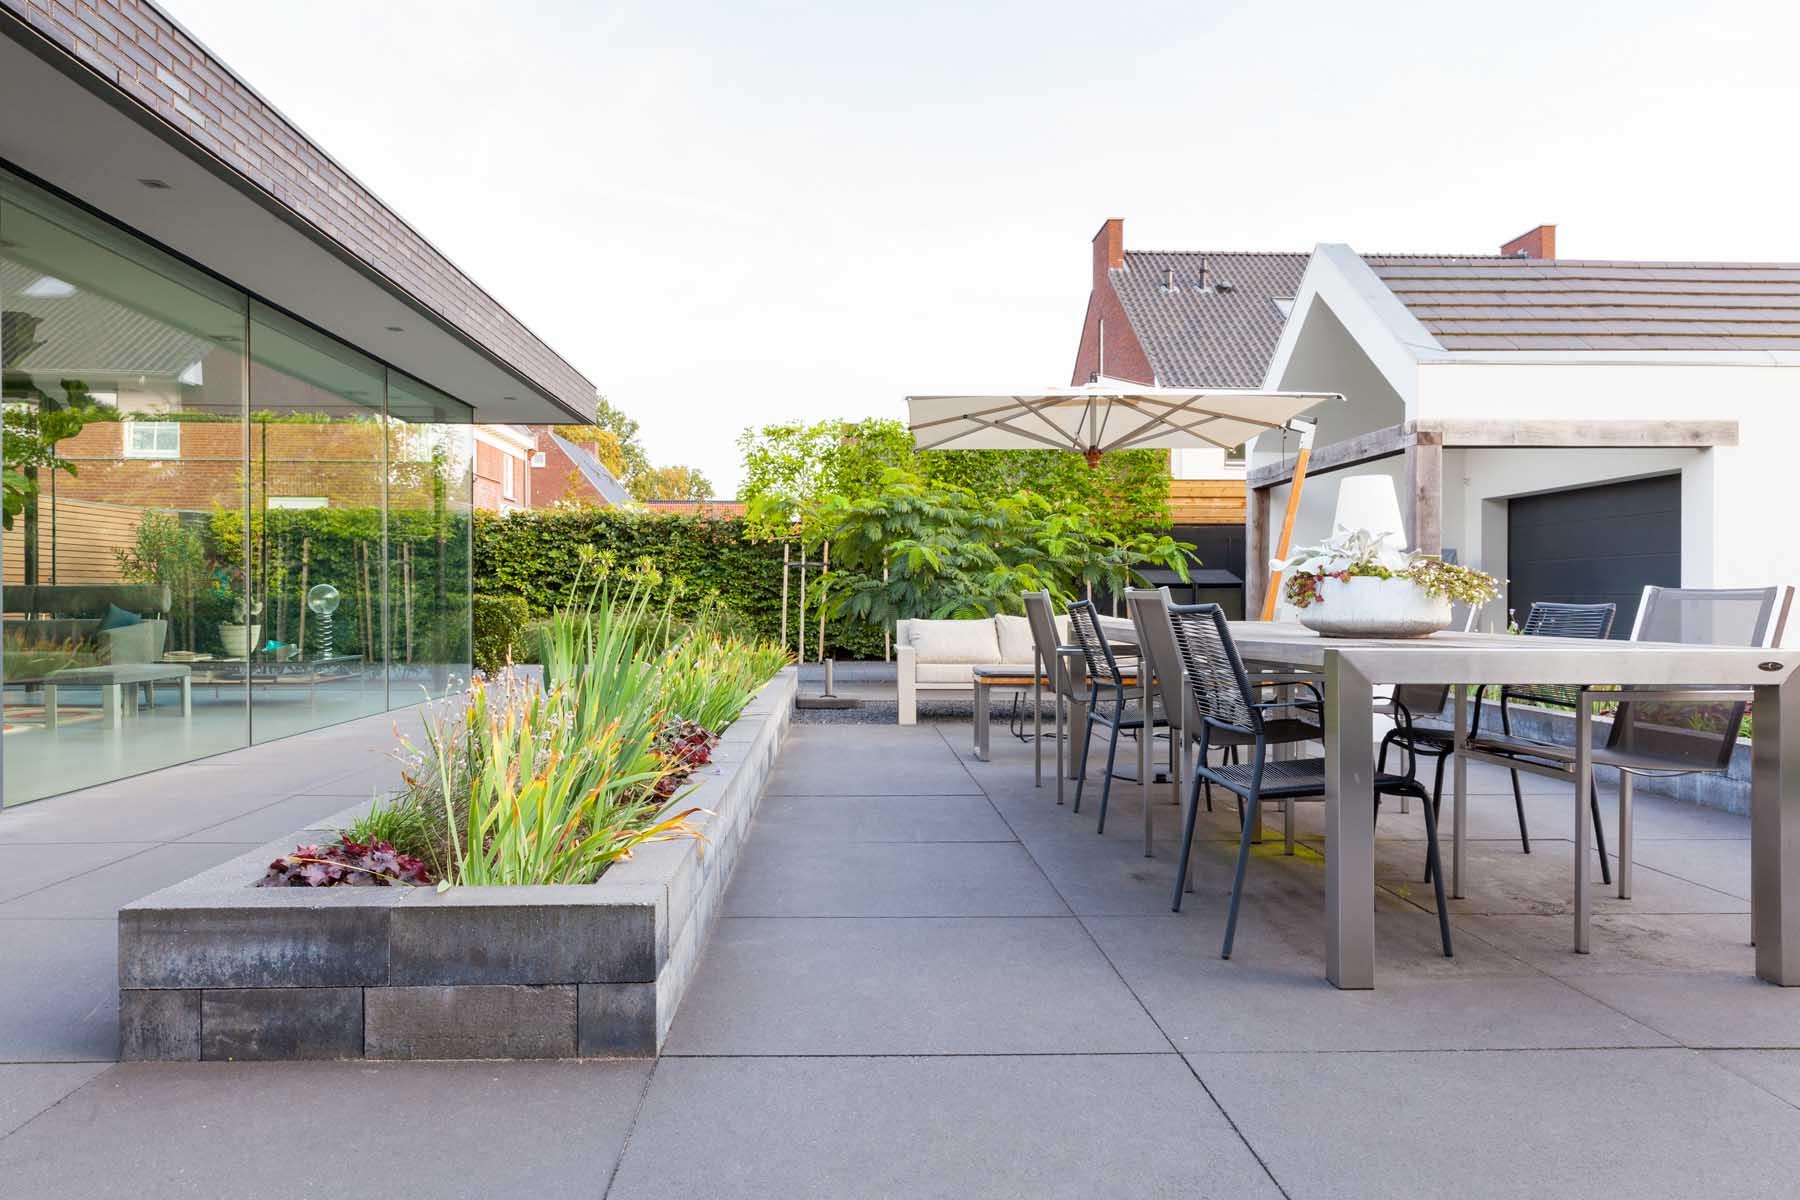 Glazen Pui Woning : 15 verbouwing woning best glazen pui naadloos binnen buiten